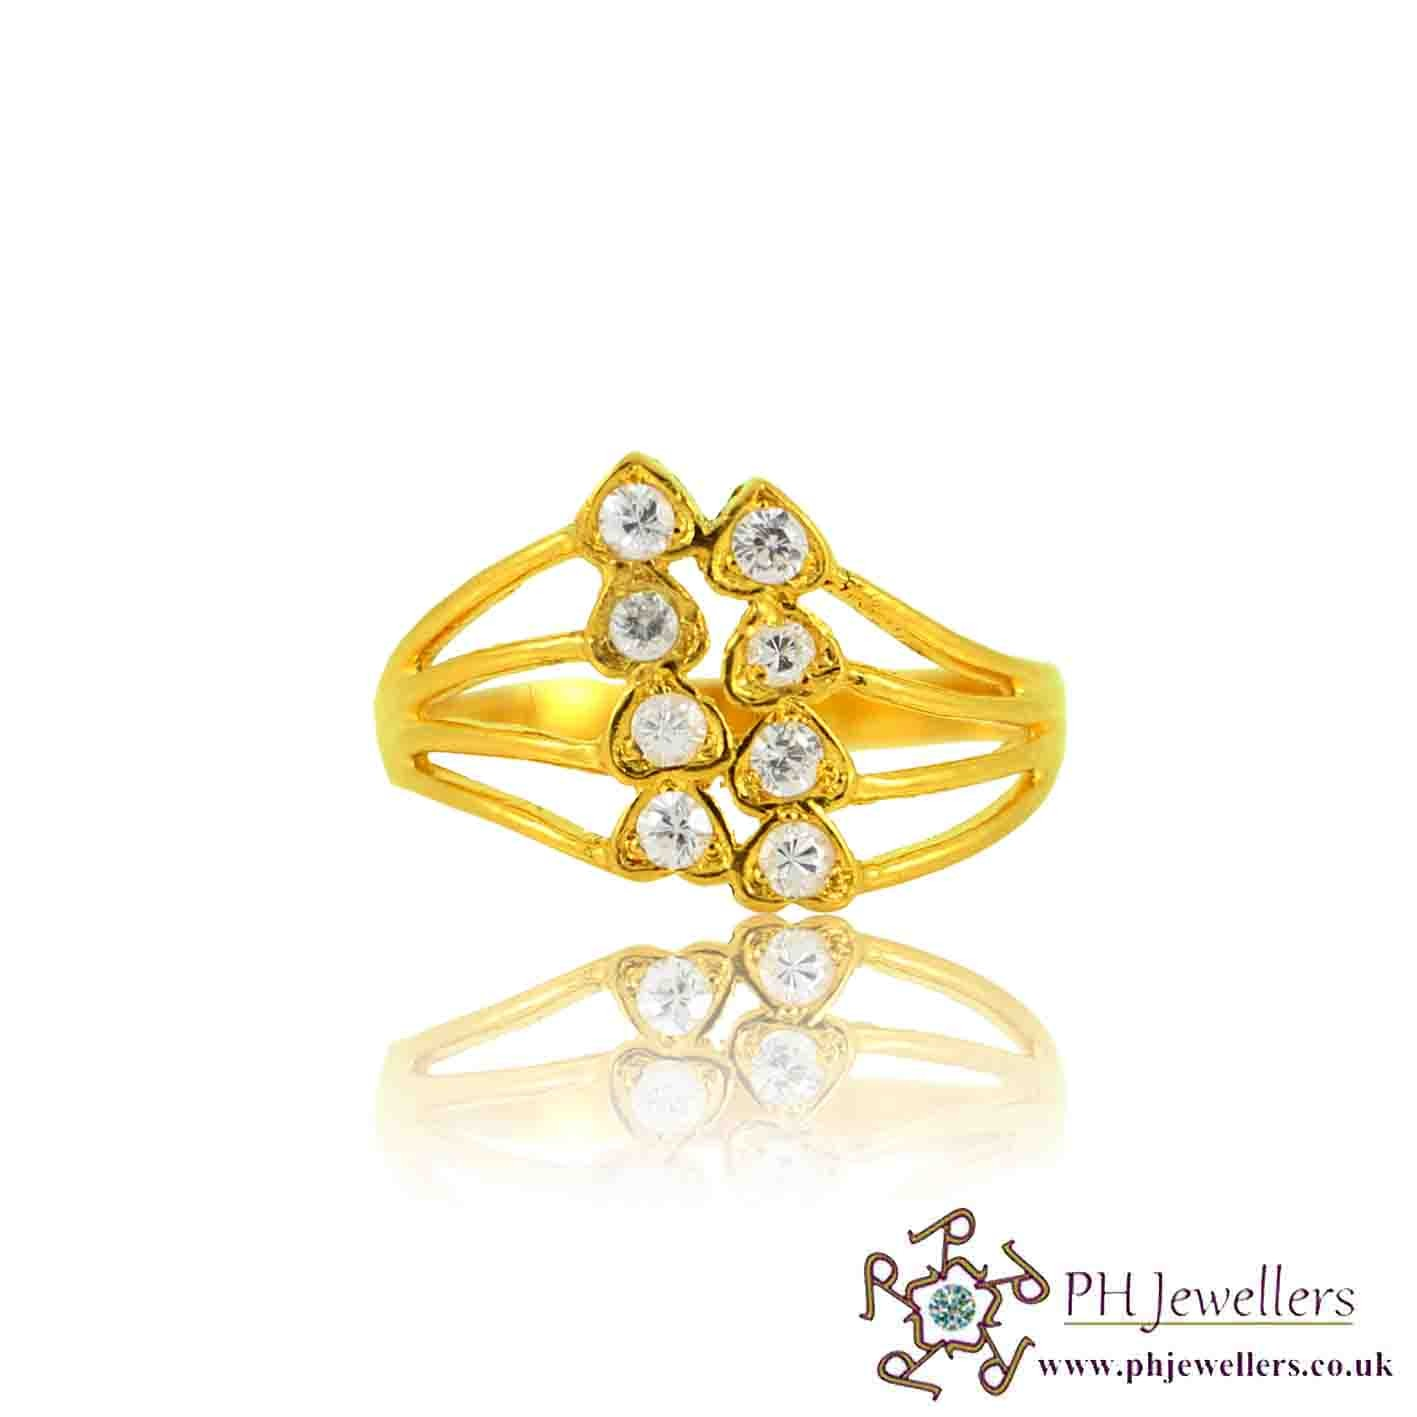 22ct 916 Yellow Gold Hallmark Heart Ring CZ Size O,P SR127